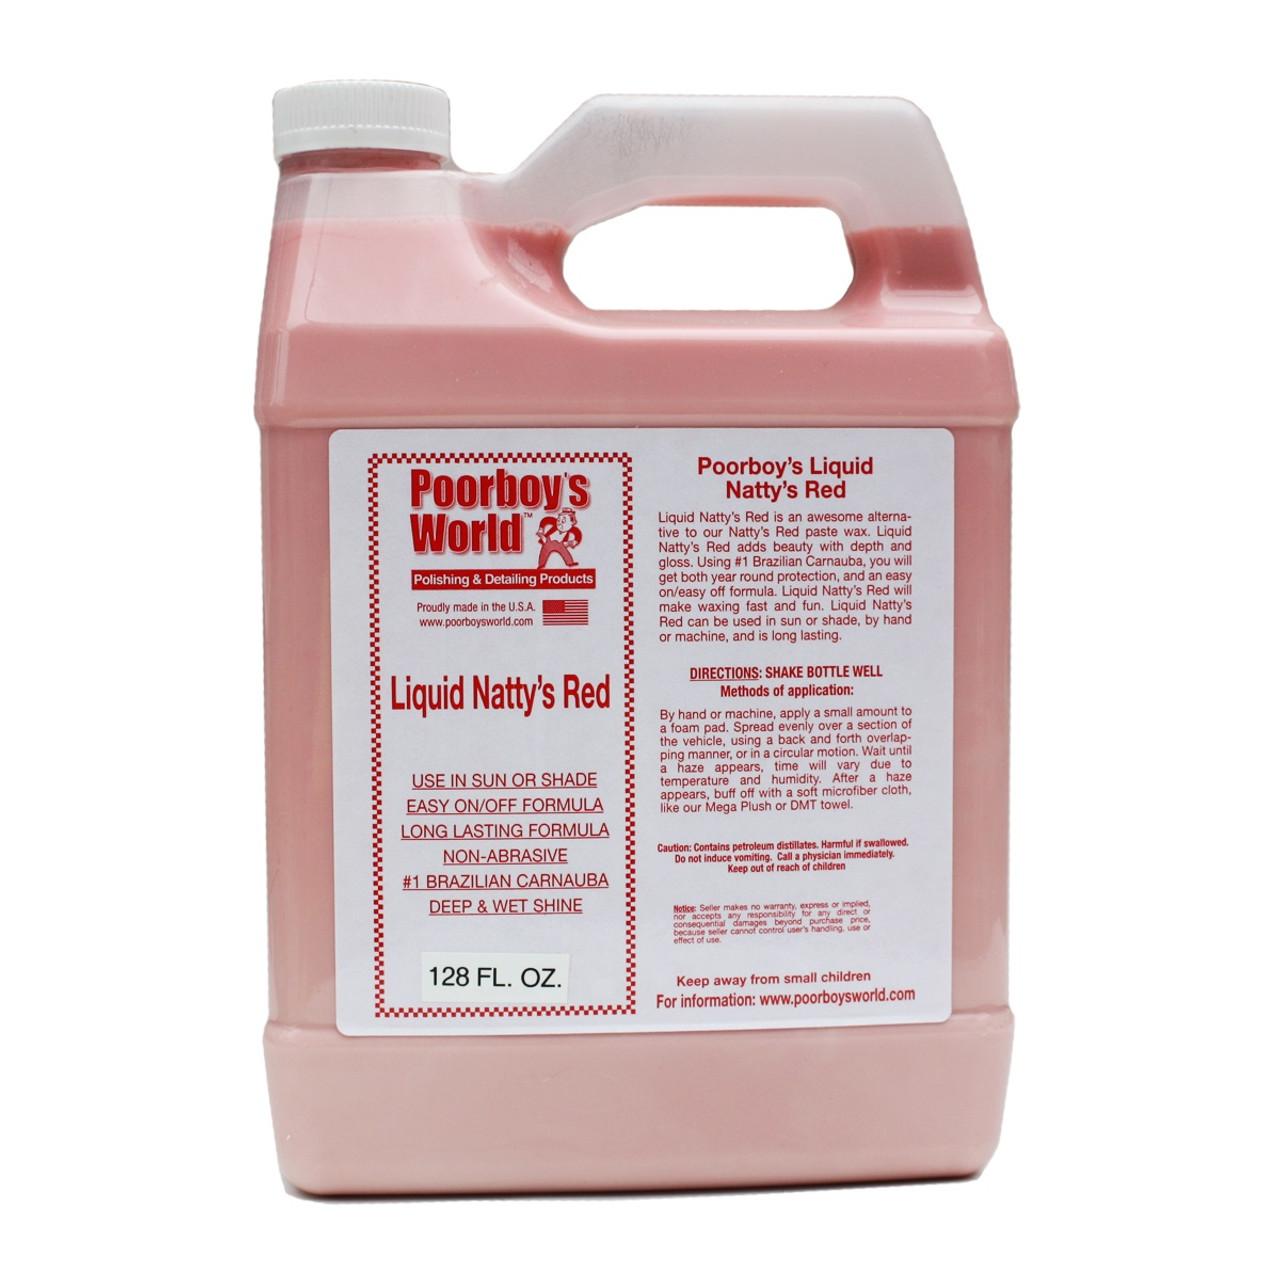 Poorboy's World Liquid Natty's Red Gallon